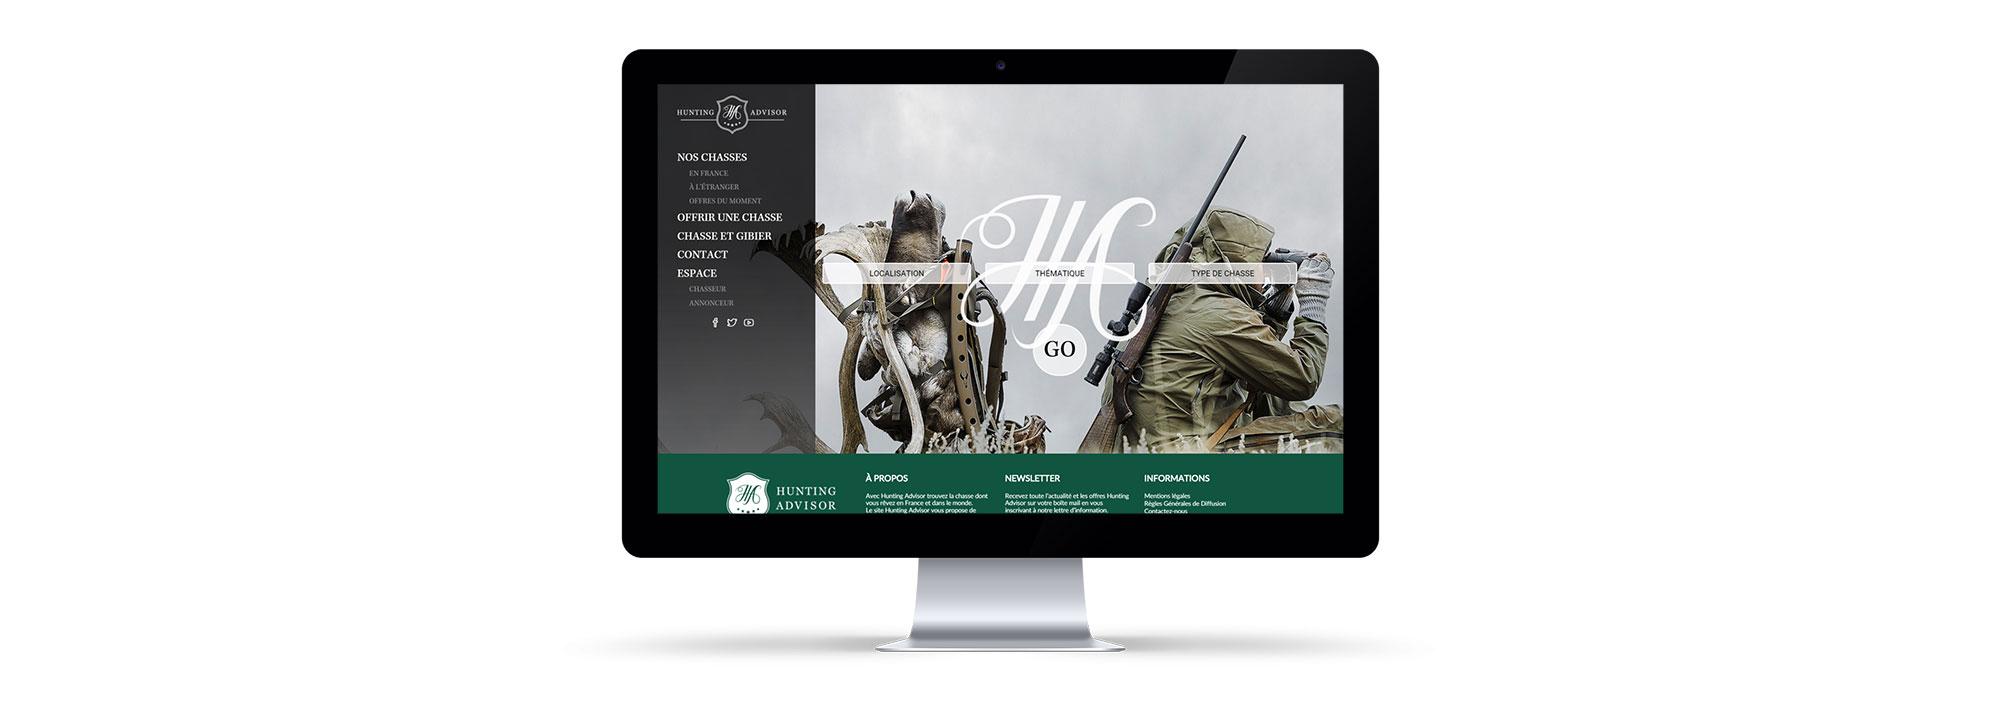 hunting-advisor-application-web-symfony